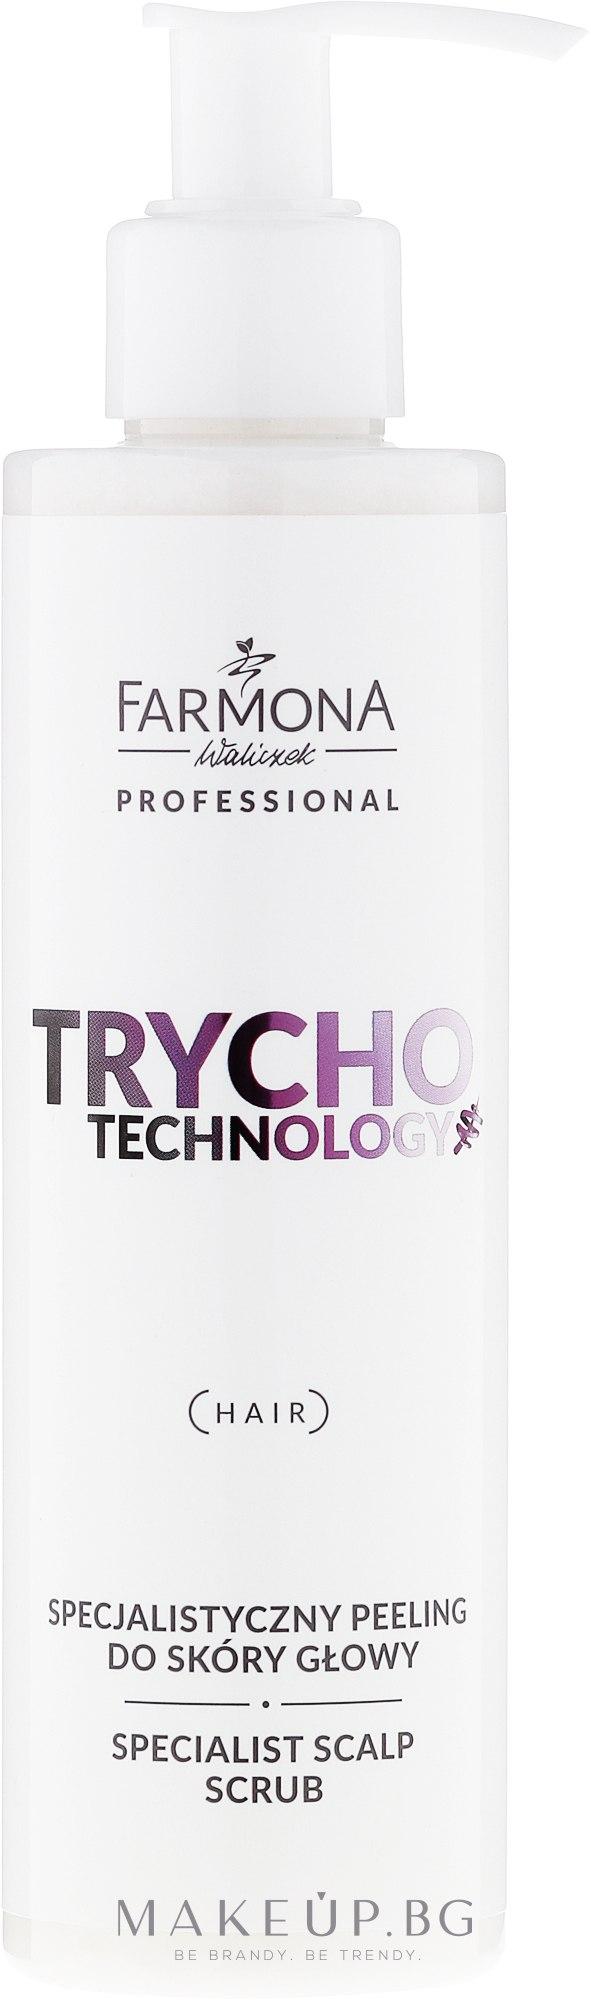 Специализиран скраб за скалп - Farmona Professional Trycho Technology Specialist Scalp Scrub — снимка 200 ml